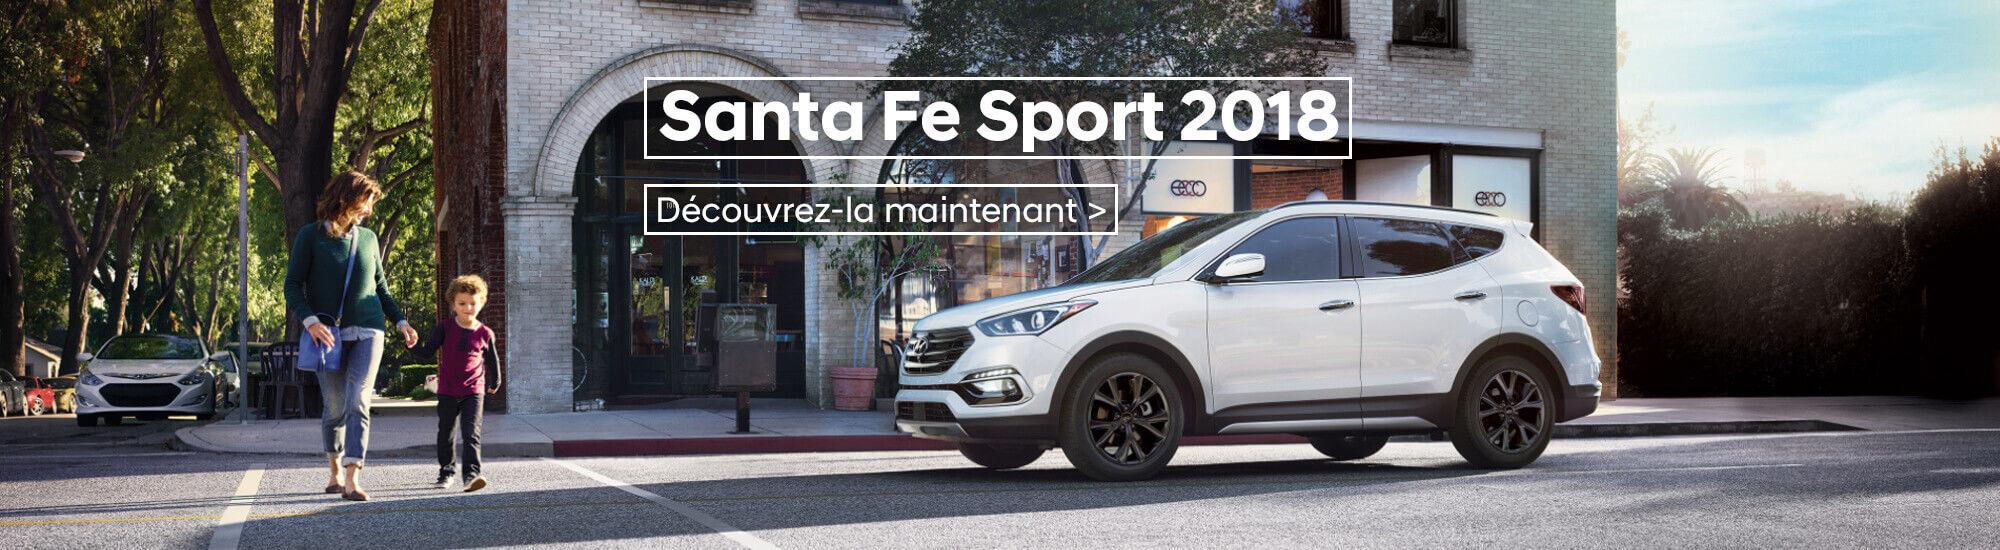 Santa fe sport 2018